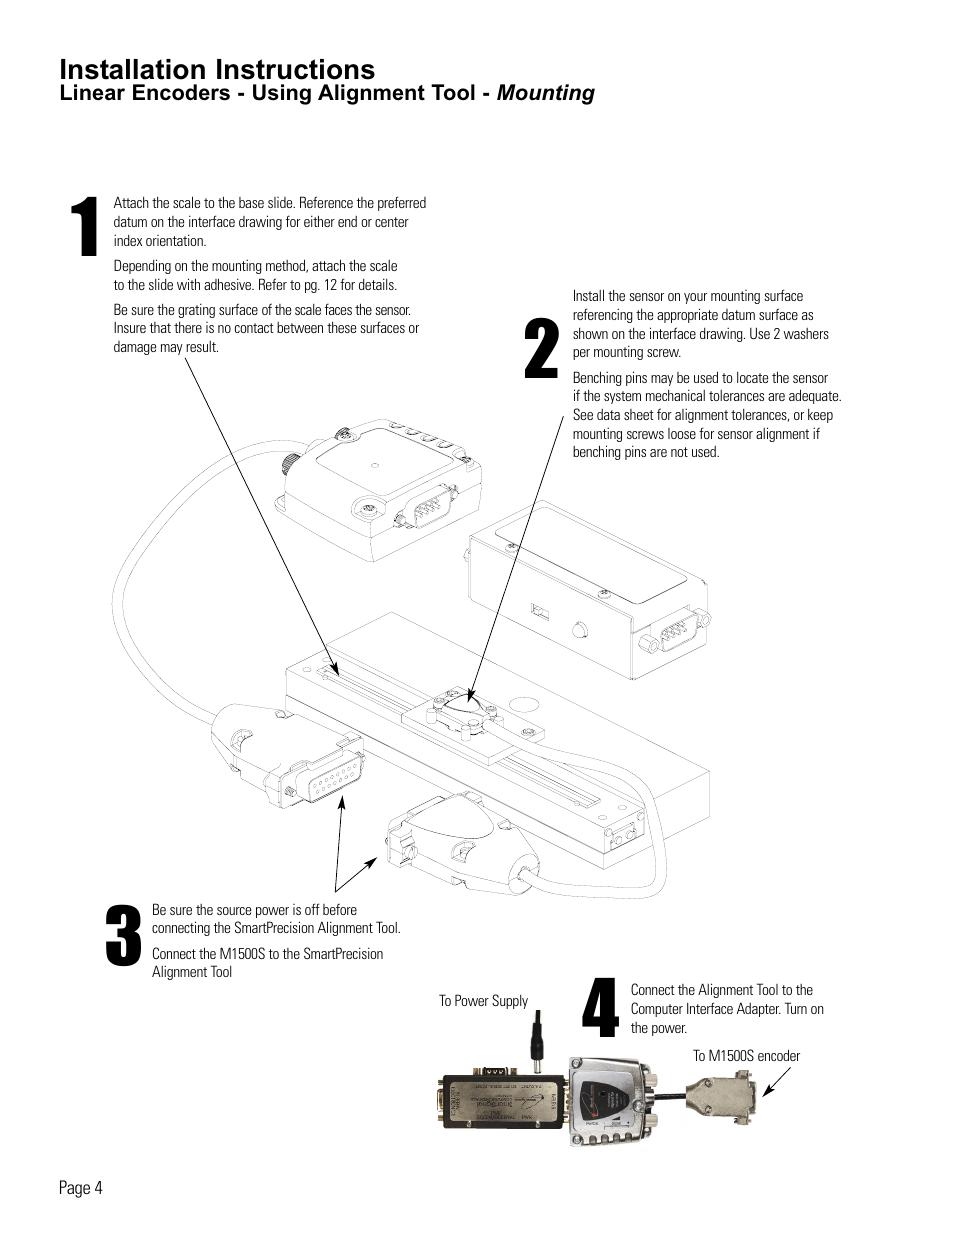 medium resolution of linear encoder installation using alignment tool microe 1500s mercury user manual page 6 19